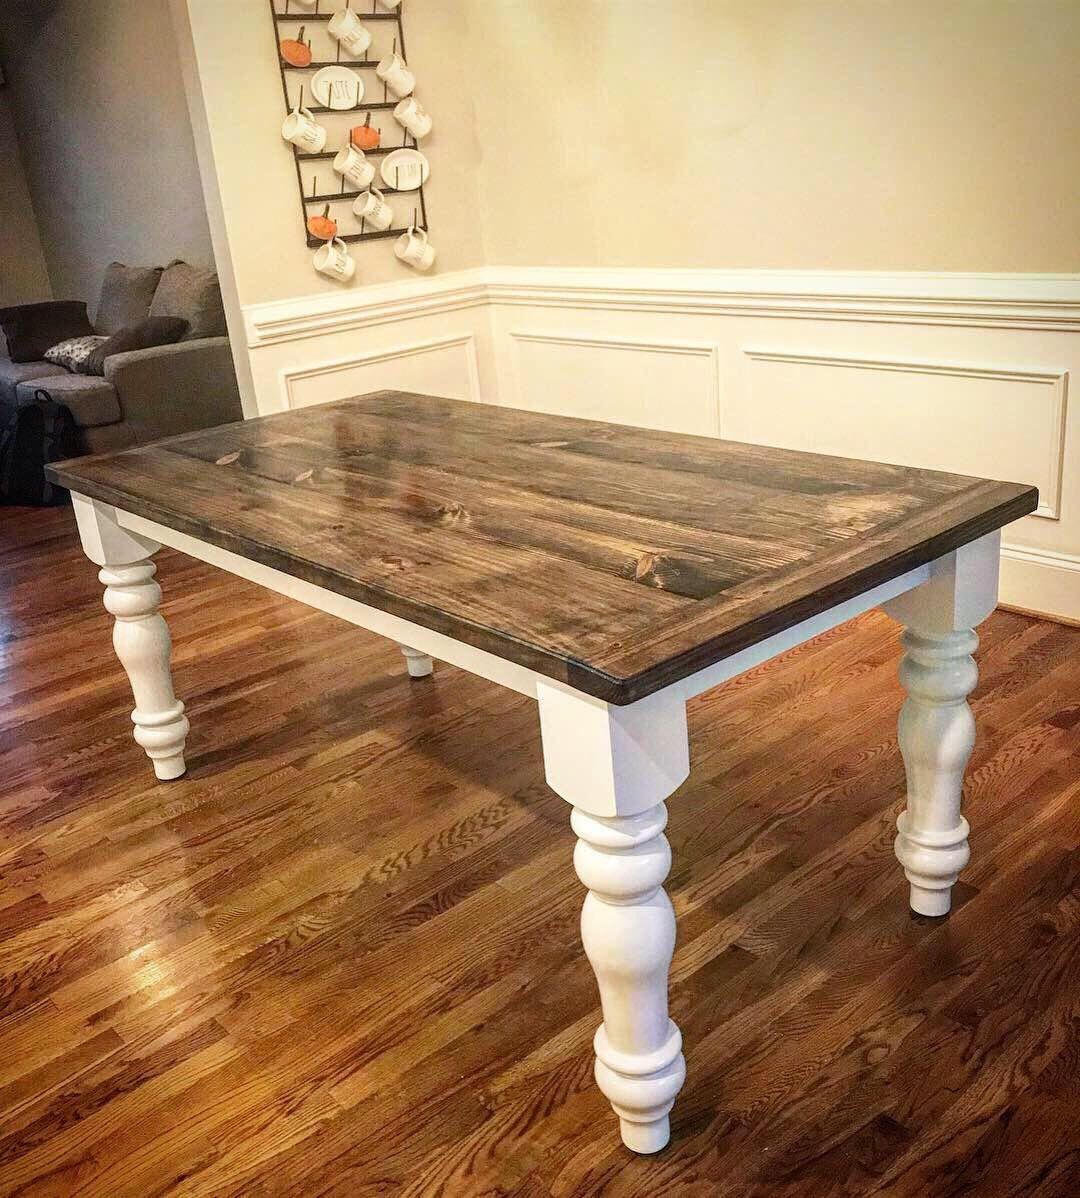 Turned Leg Farmhouse Table Built By Hillbuildit Creations